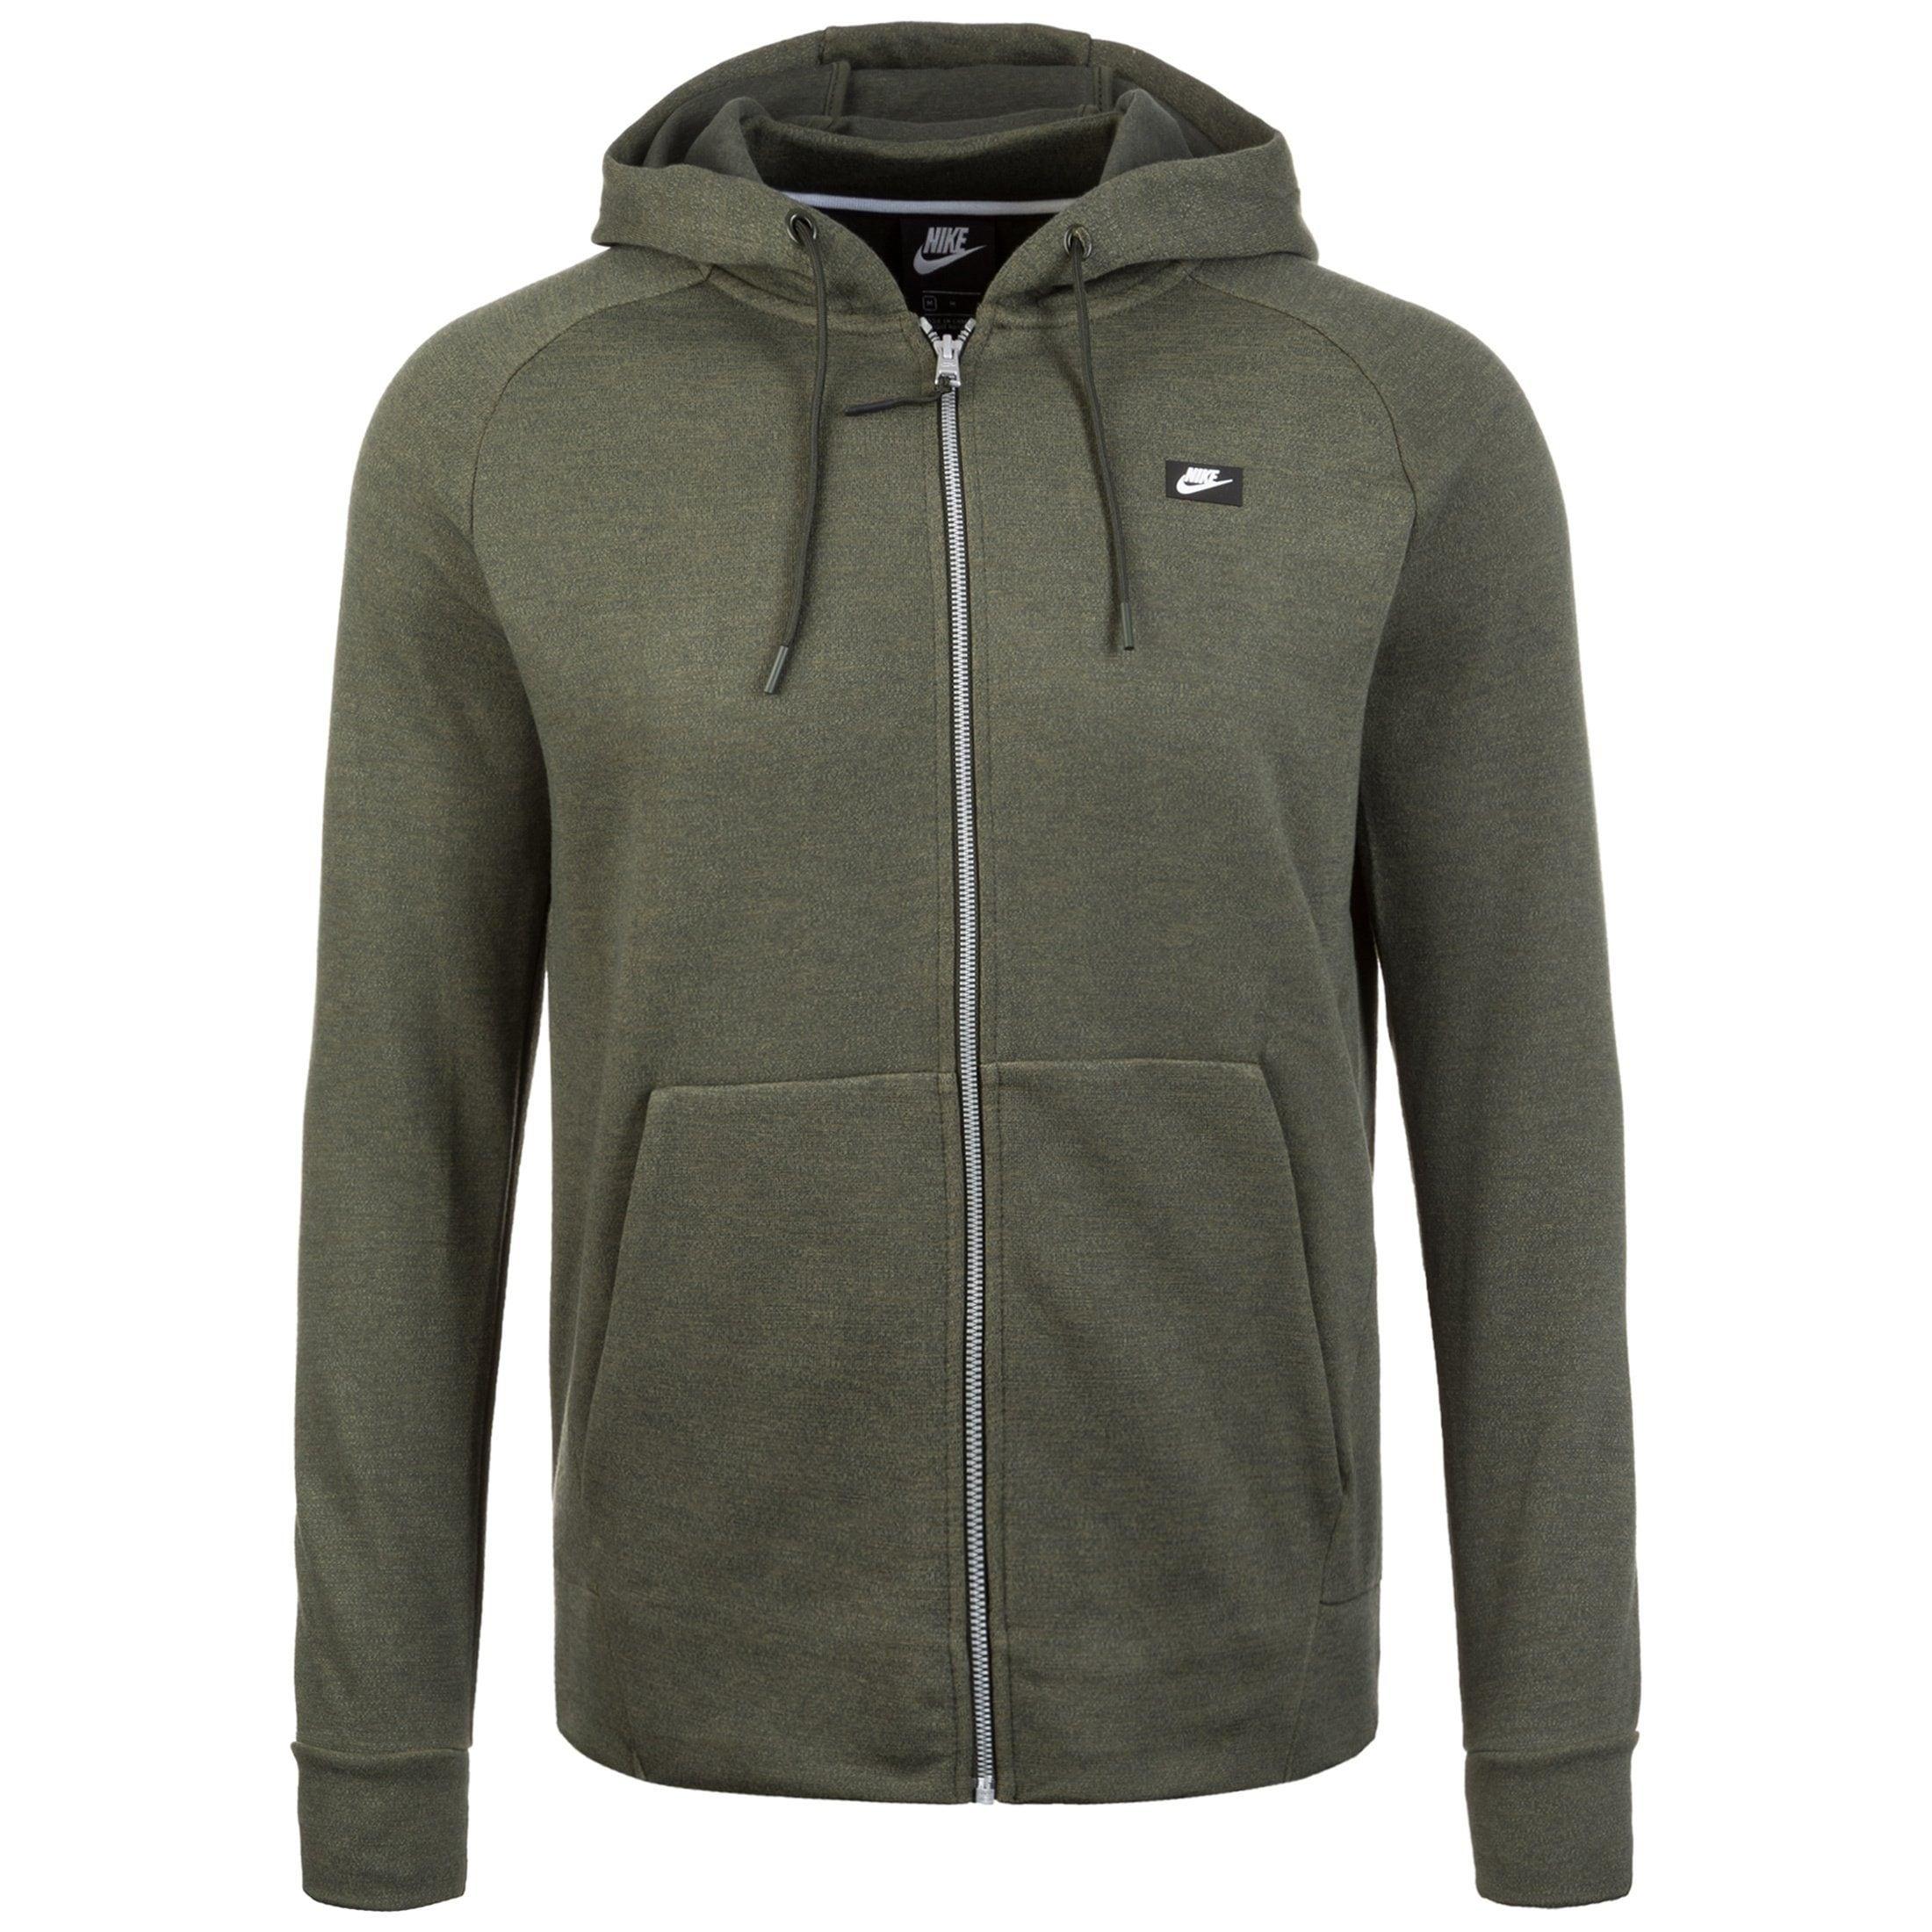 Nike Sportswear Kapuzensweatjacke Optic Fleece Preisvergleich